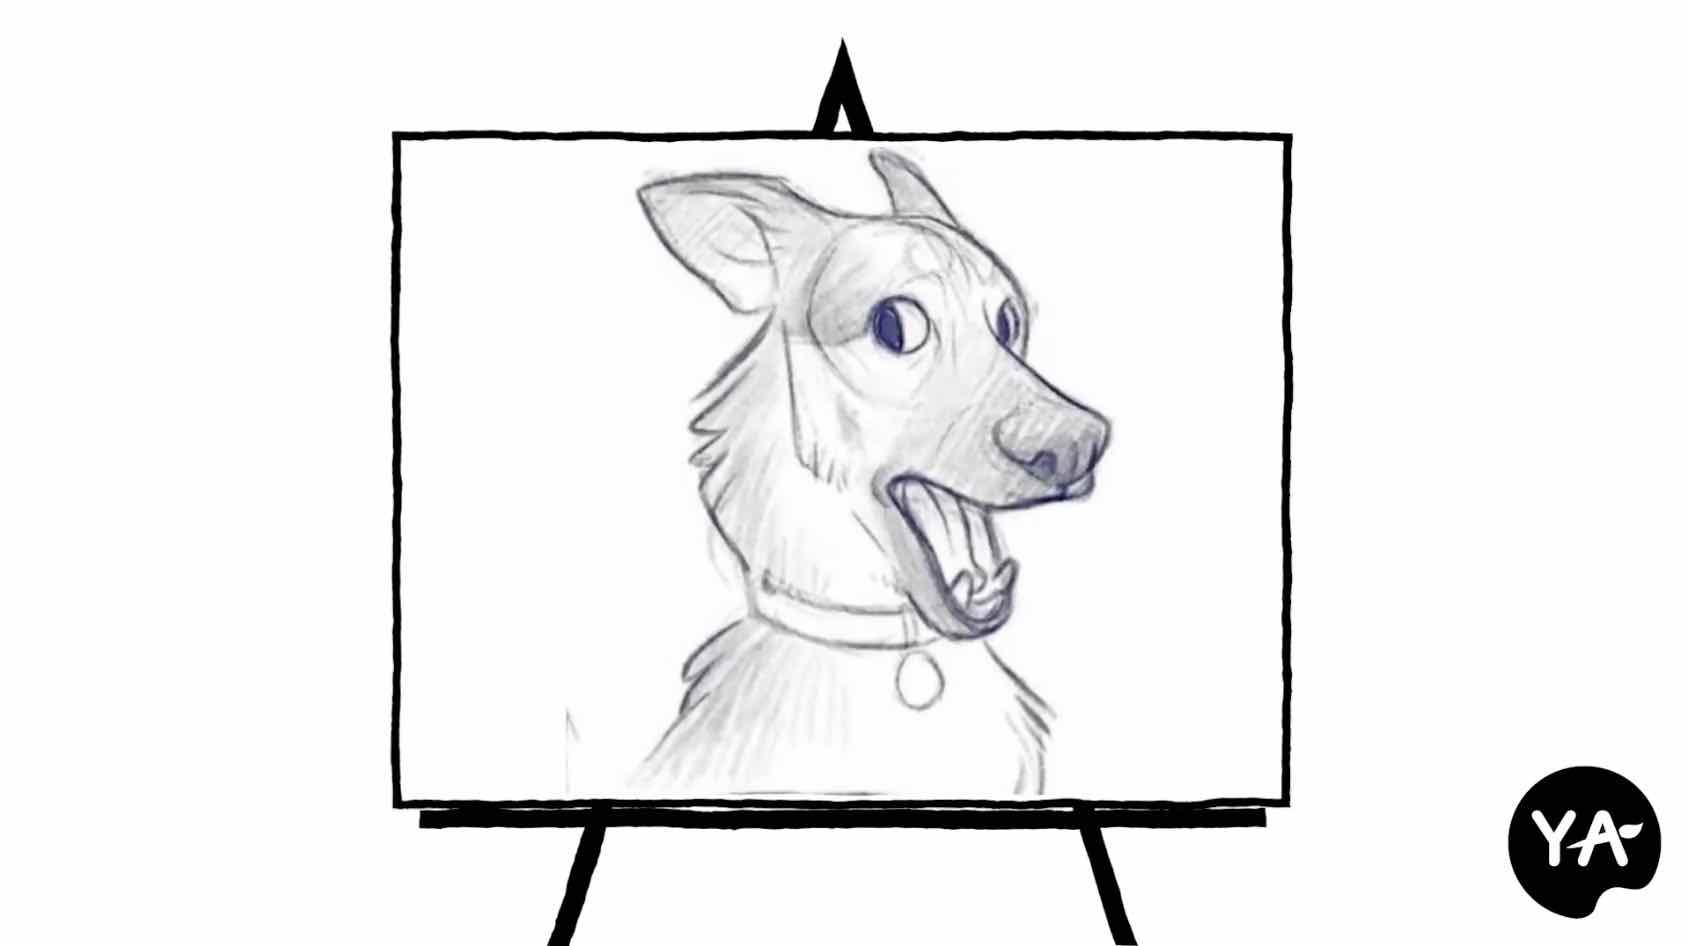 pencil sketch of a cartoon dog